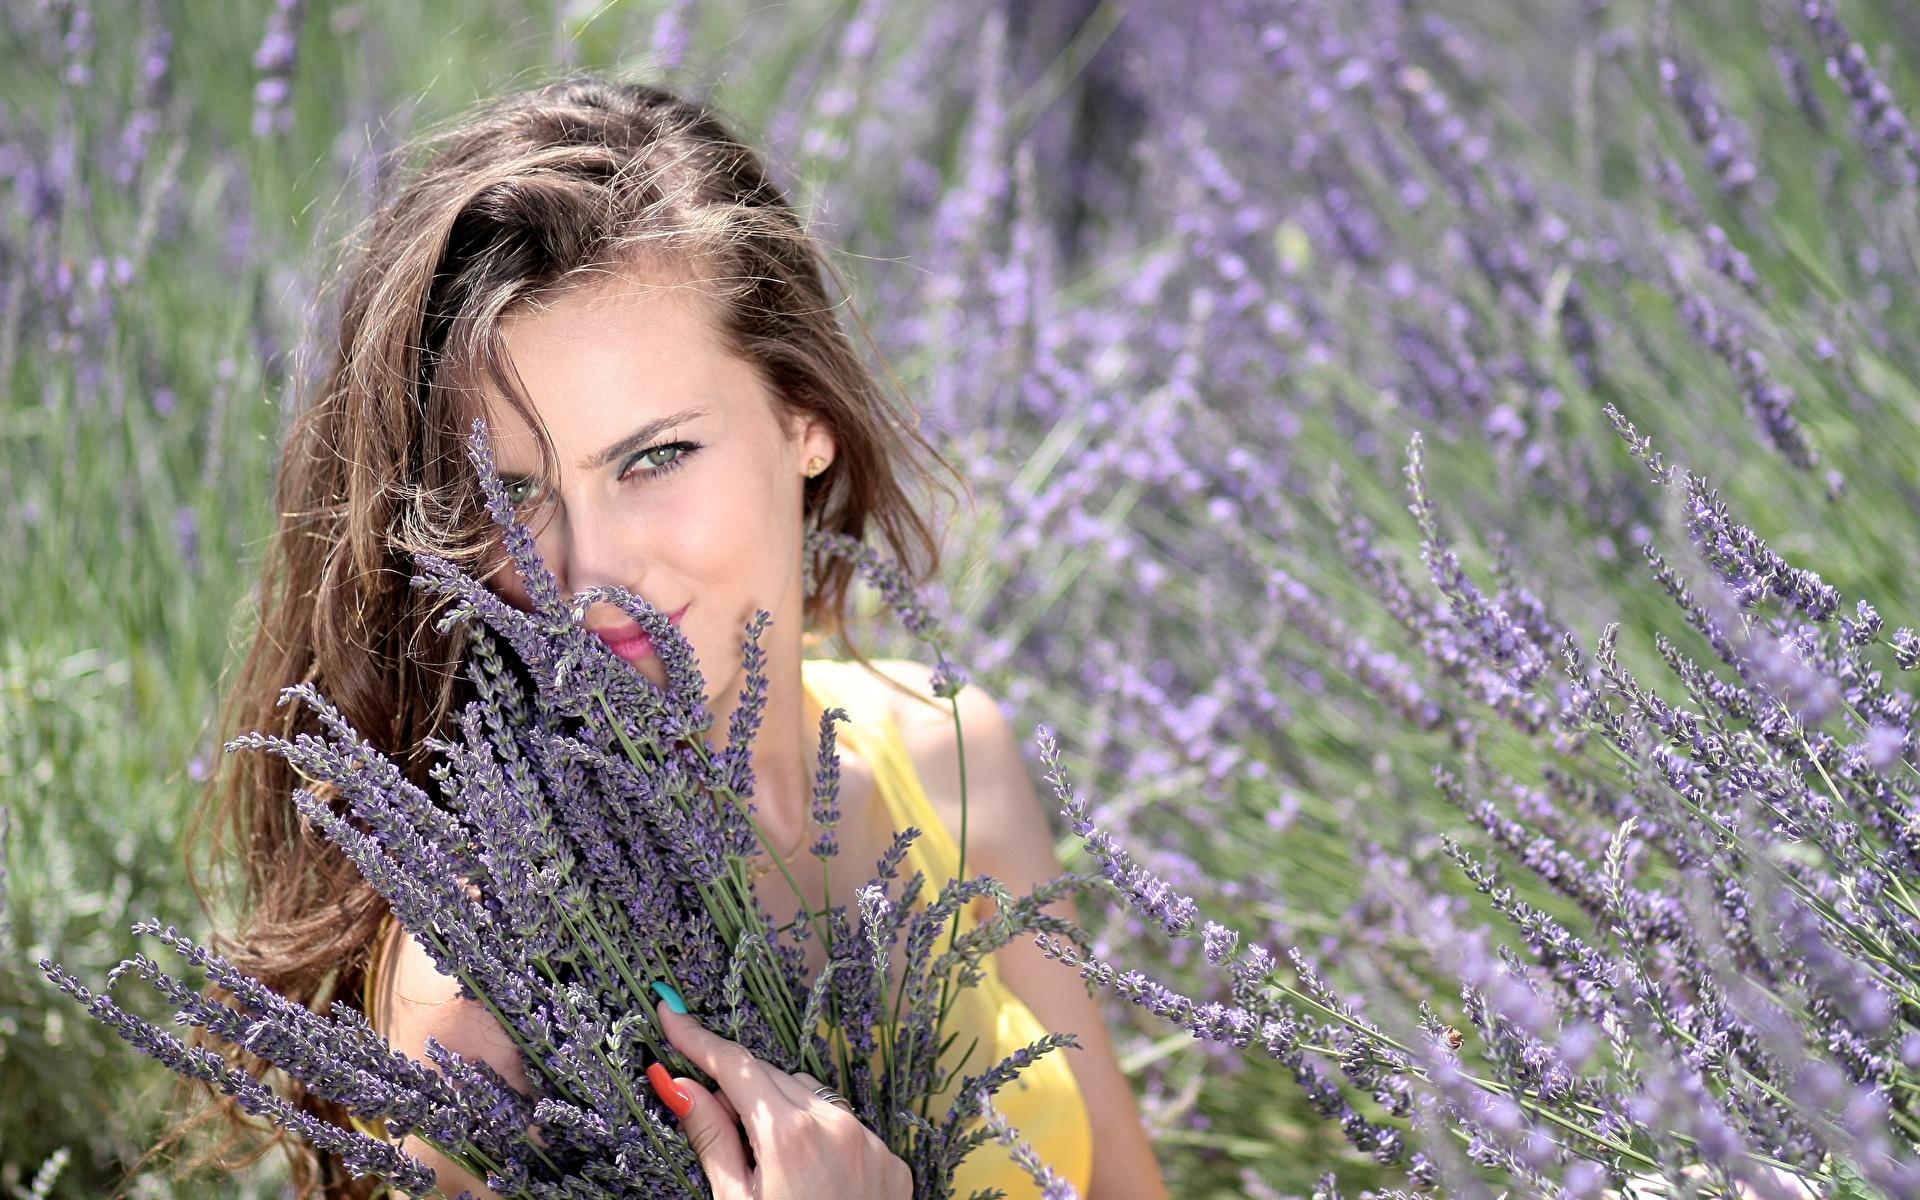 Фото Шатенка Маникюр Улыбка Красивые Девушки Лаванда Взгляд 1920x1200 смотрит